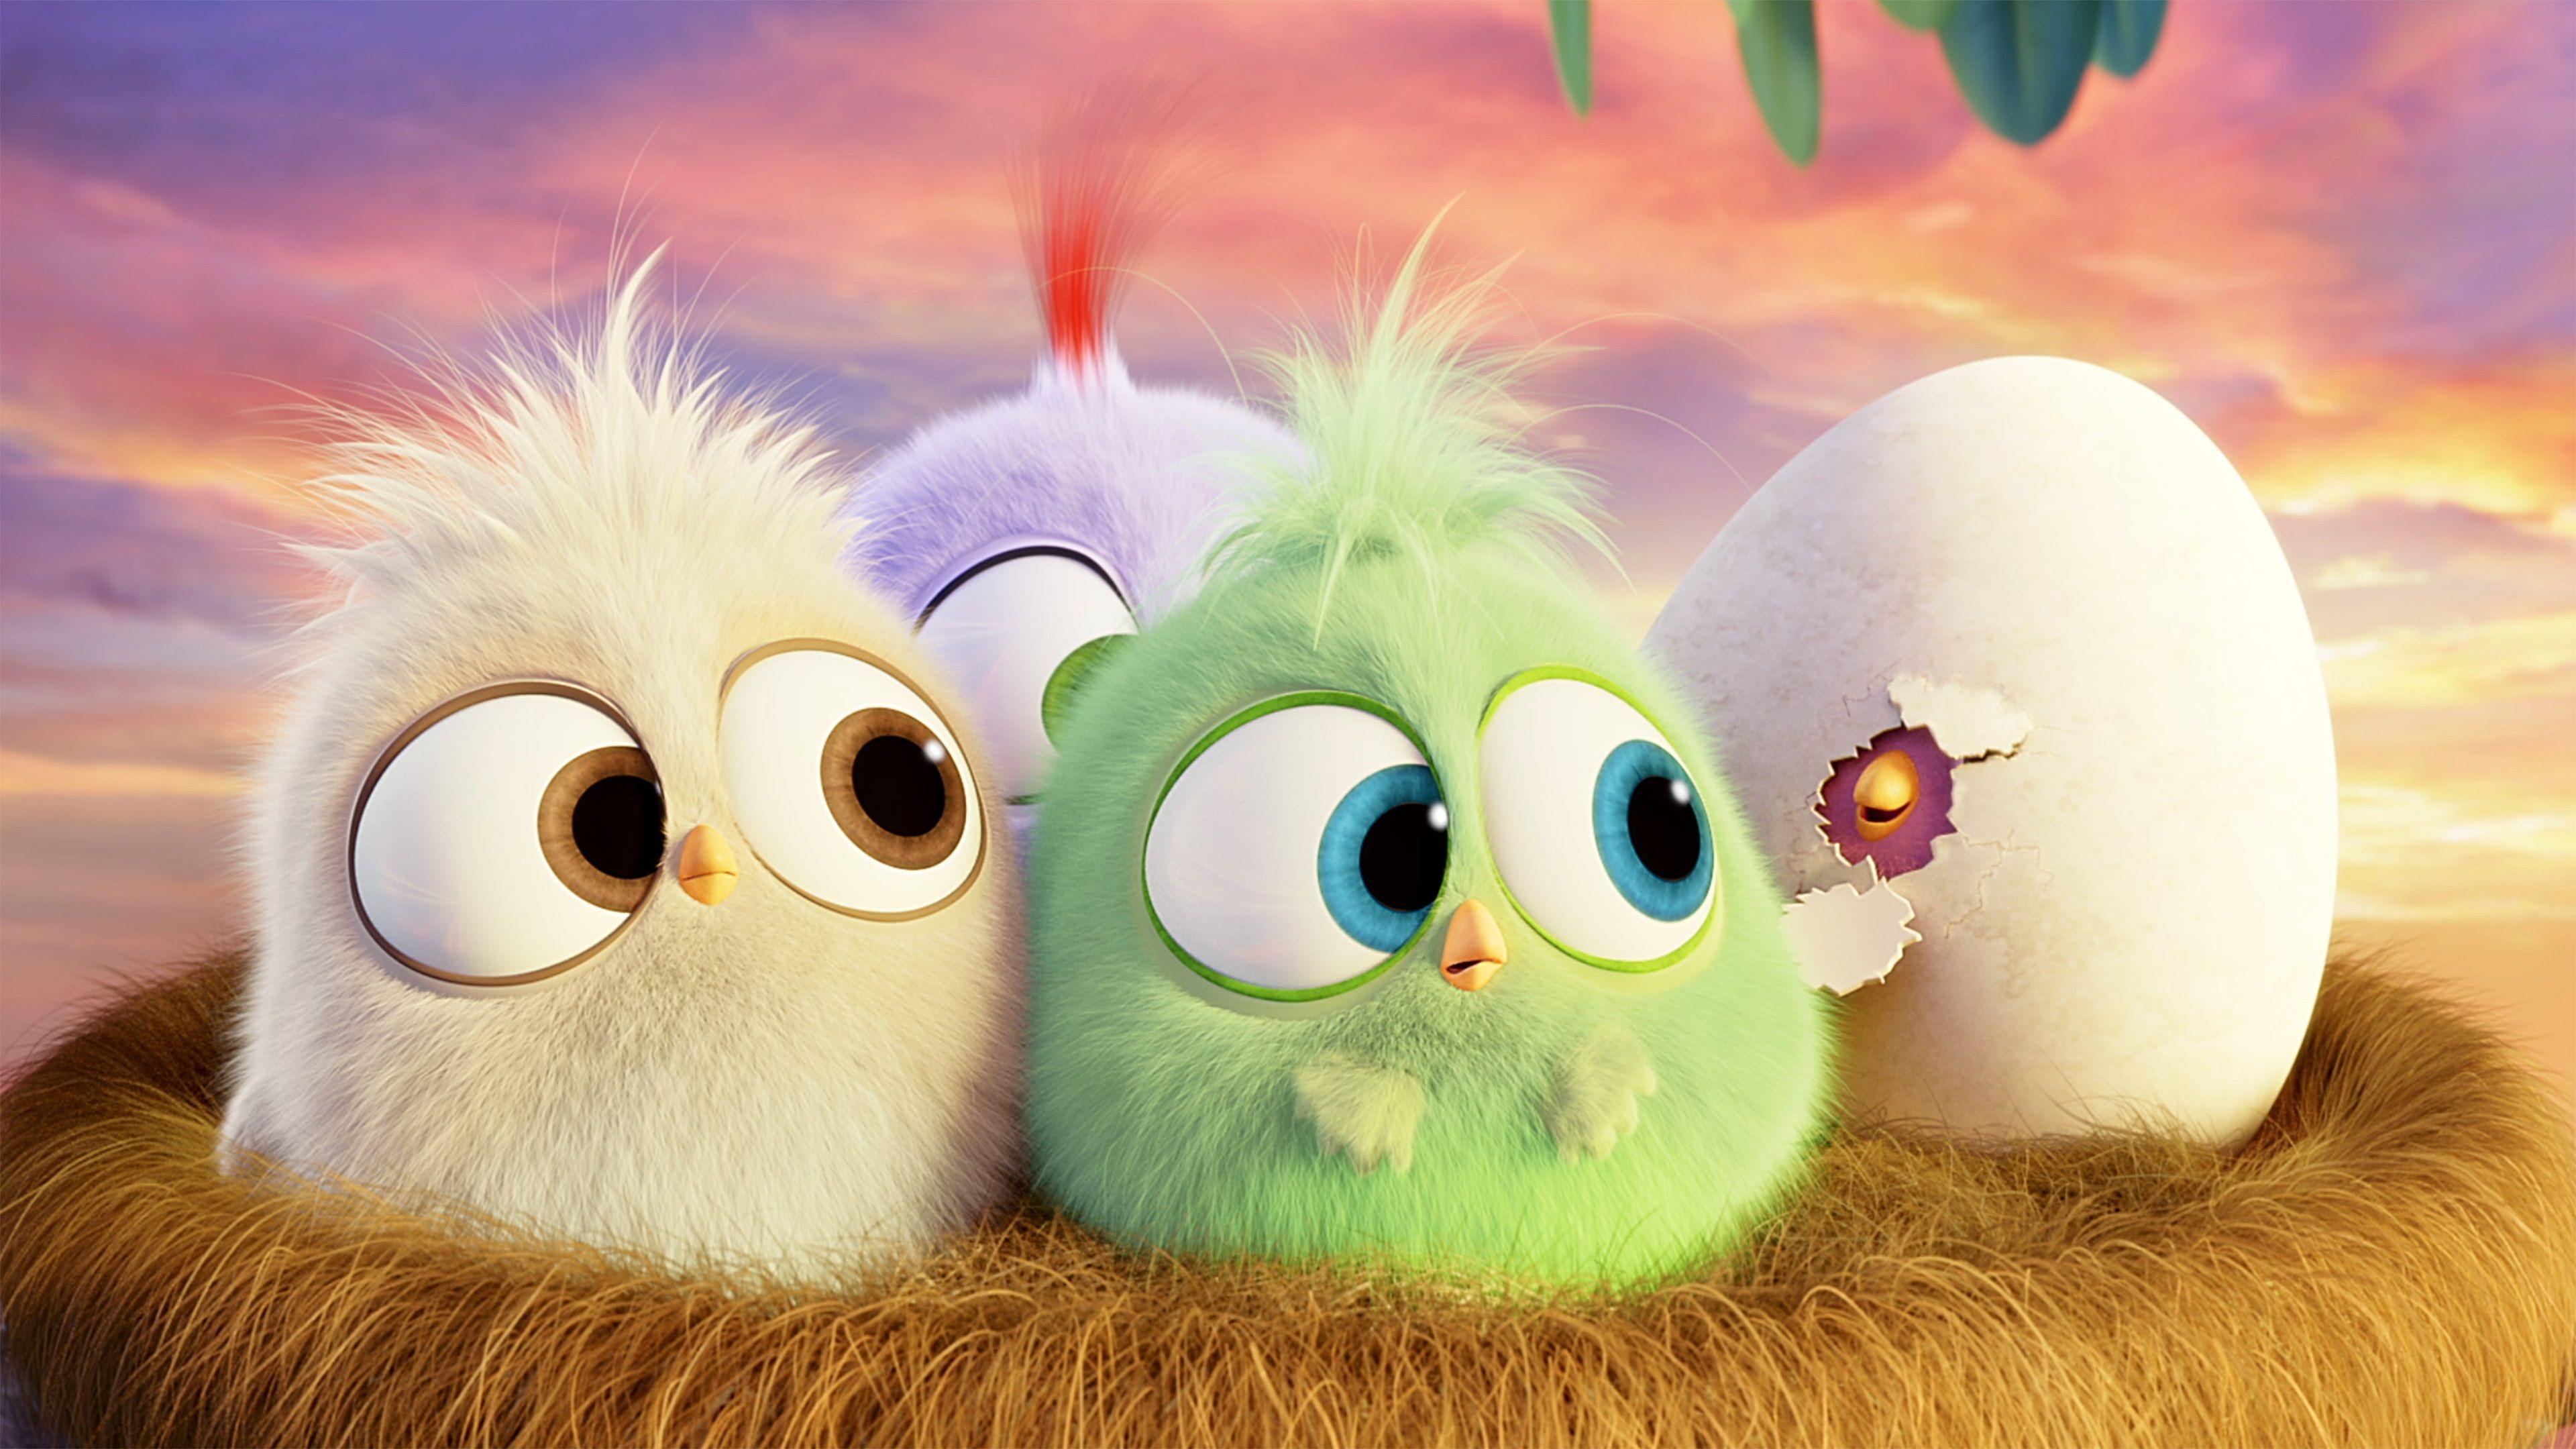 3840x2160 Angry Birds 4k Desktop Wallpaper Cute Wallpapers Cute Birds Cute Wallpaper Backgrounds